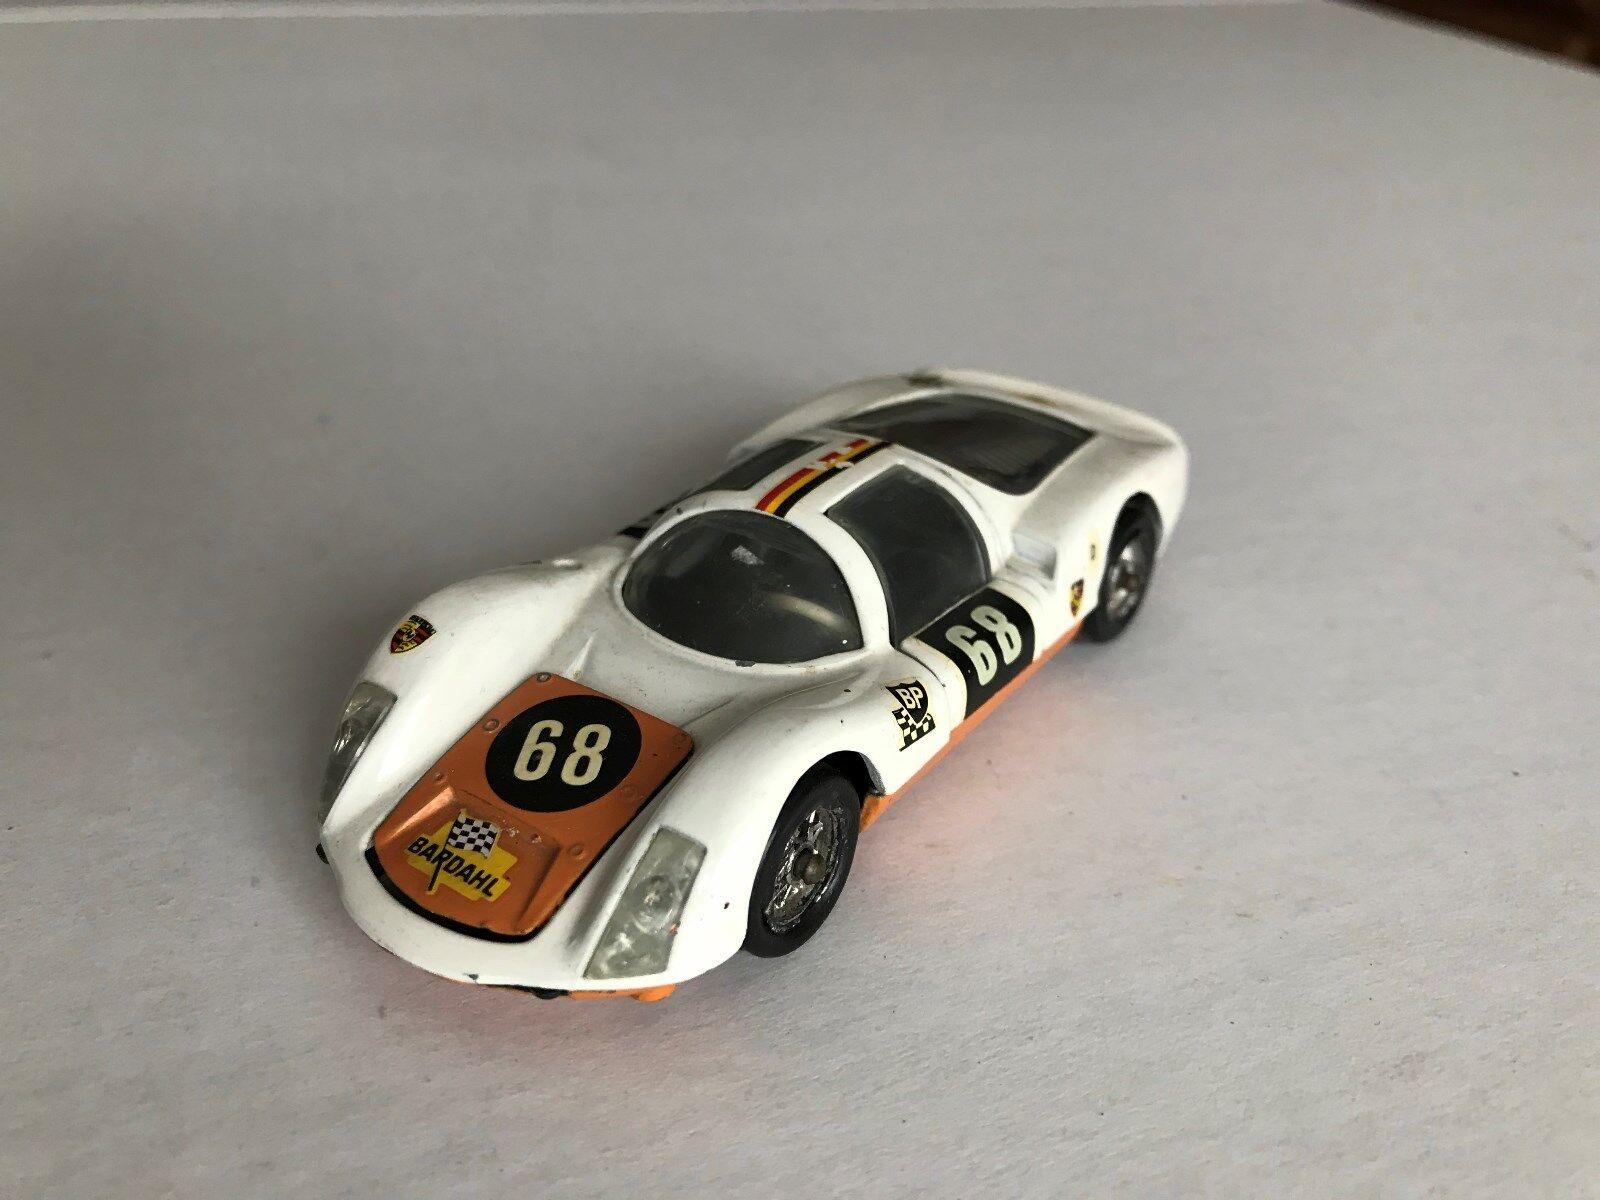 Vintage Mercury Porsche Carrera 6 1 43 Scale